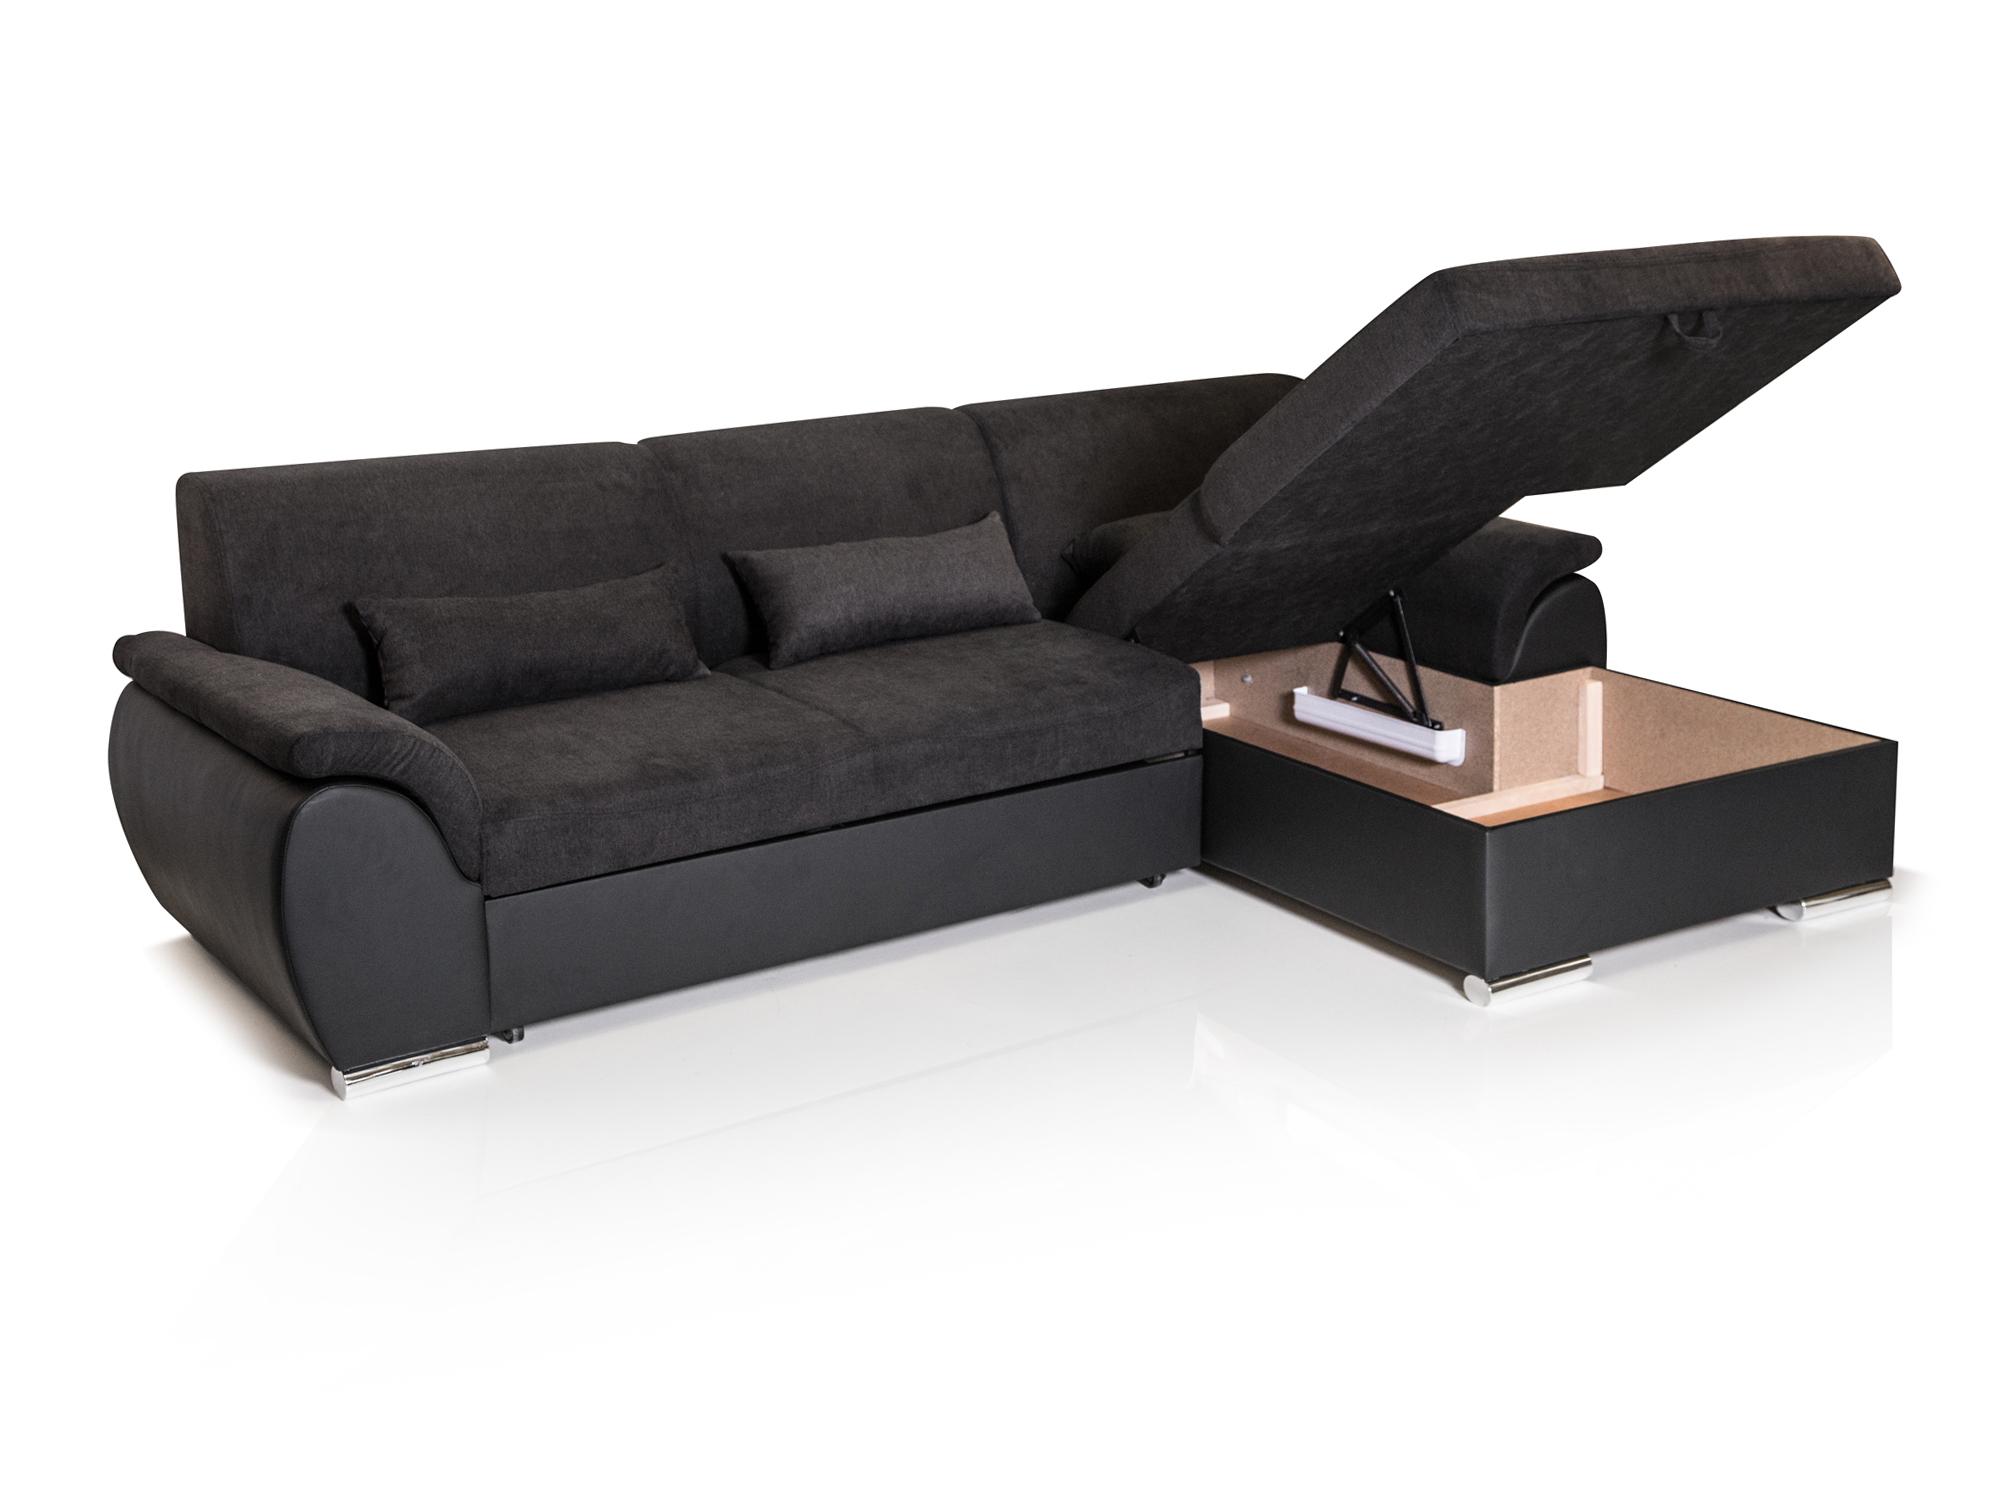 salzburg ecksofa mit bettfunktion rechts. Black Bedroom Furniture Sets. Home Design Ideas